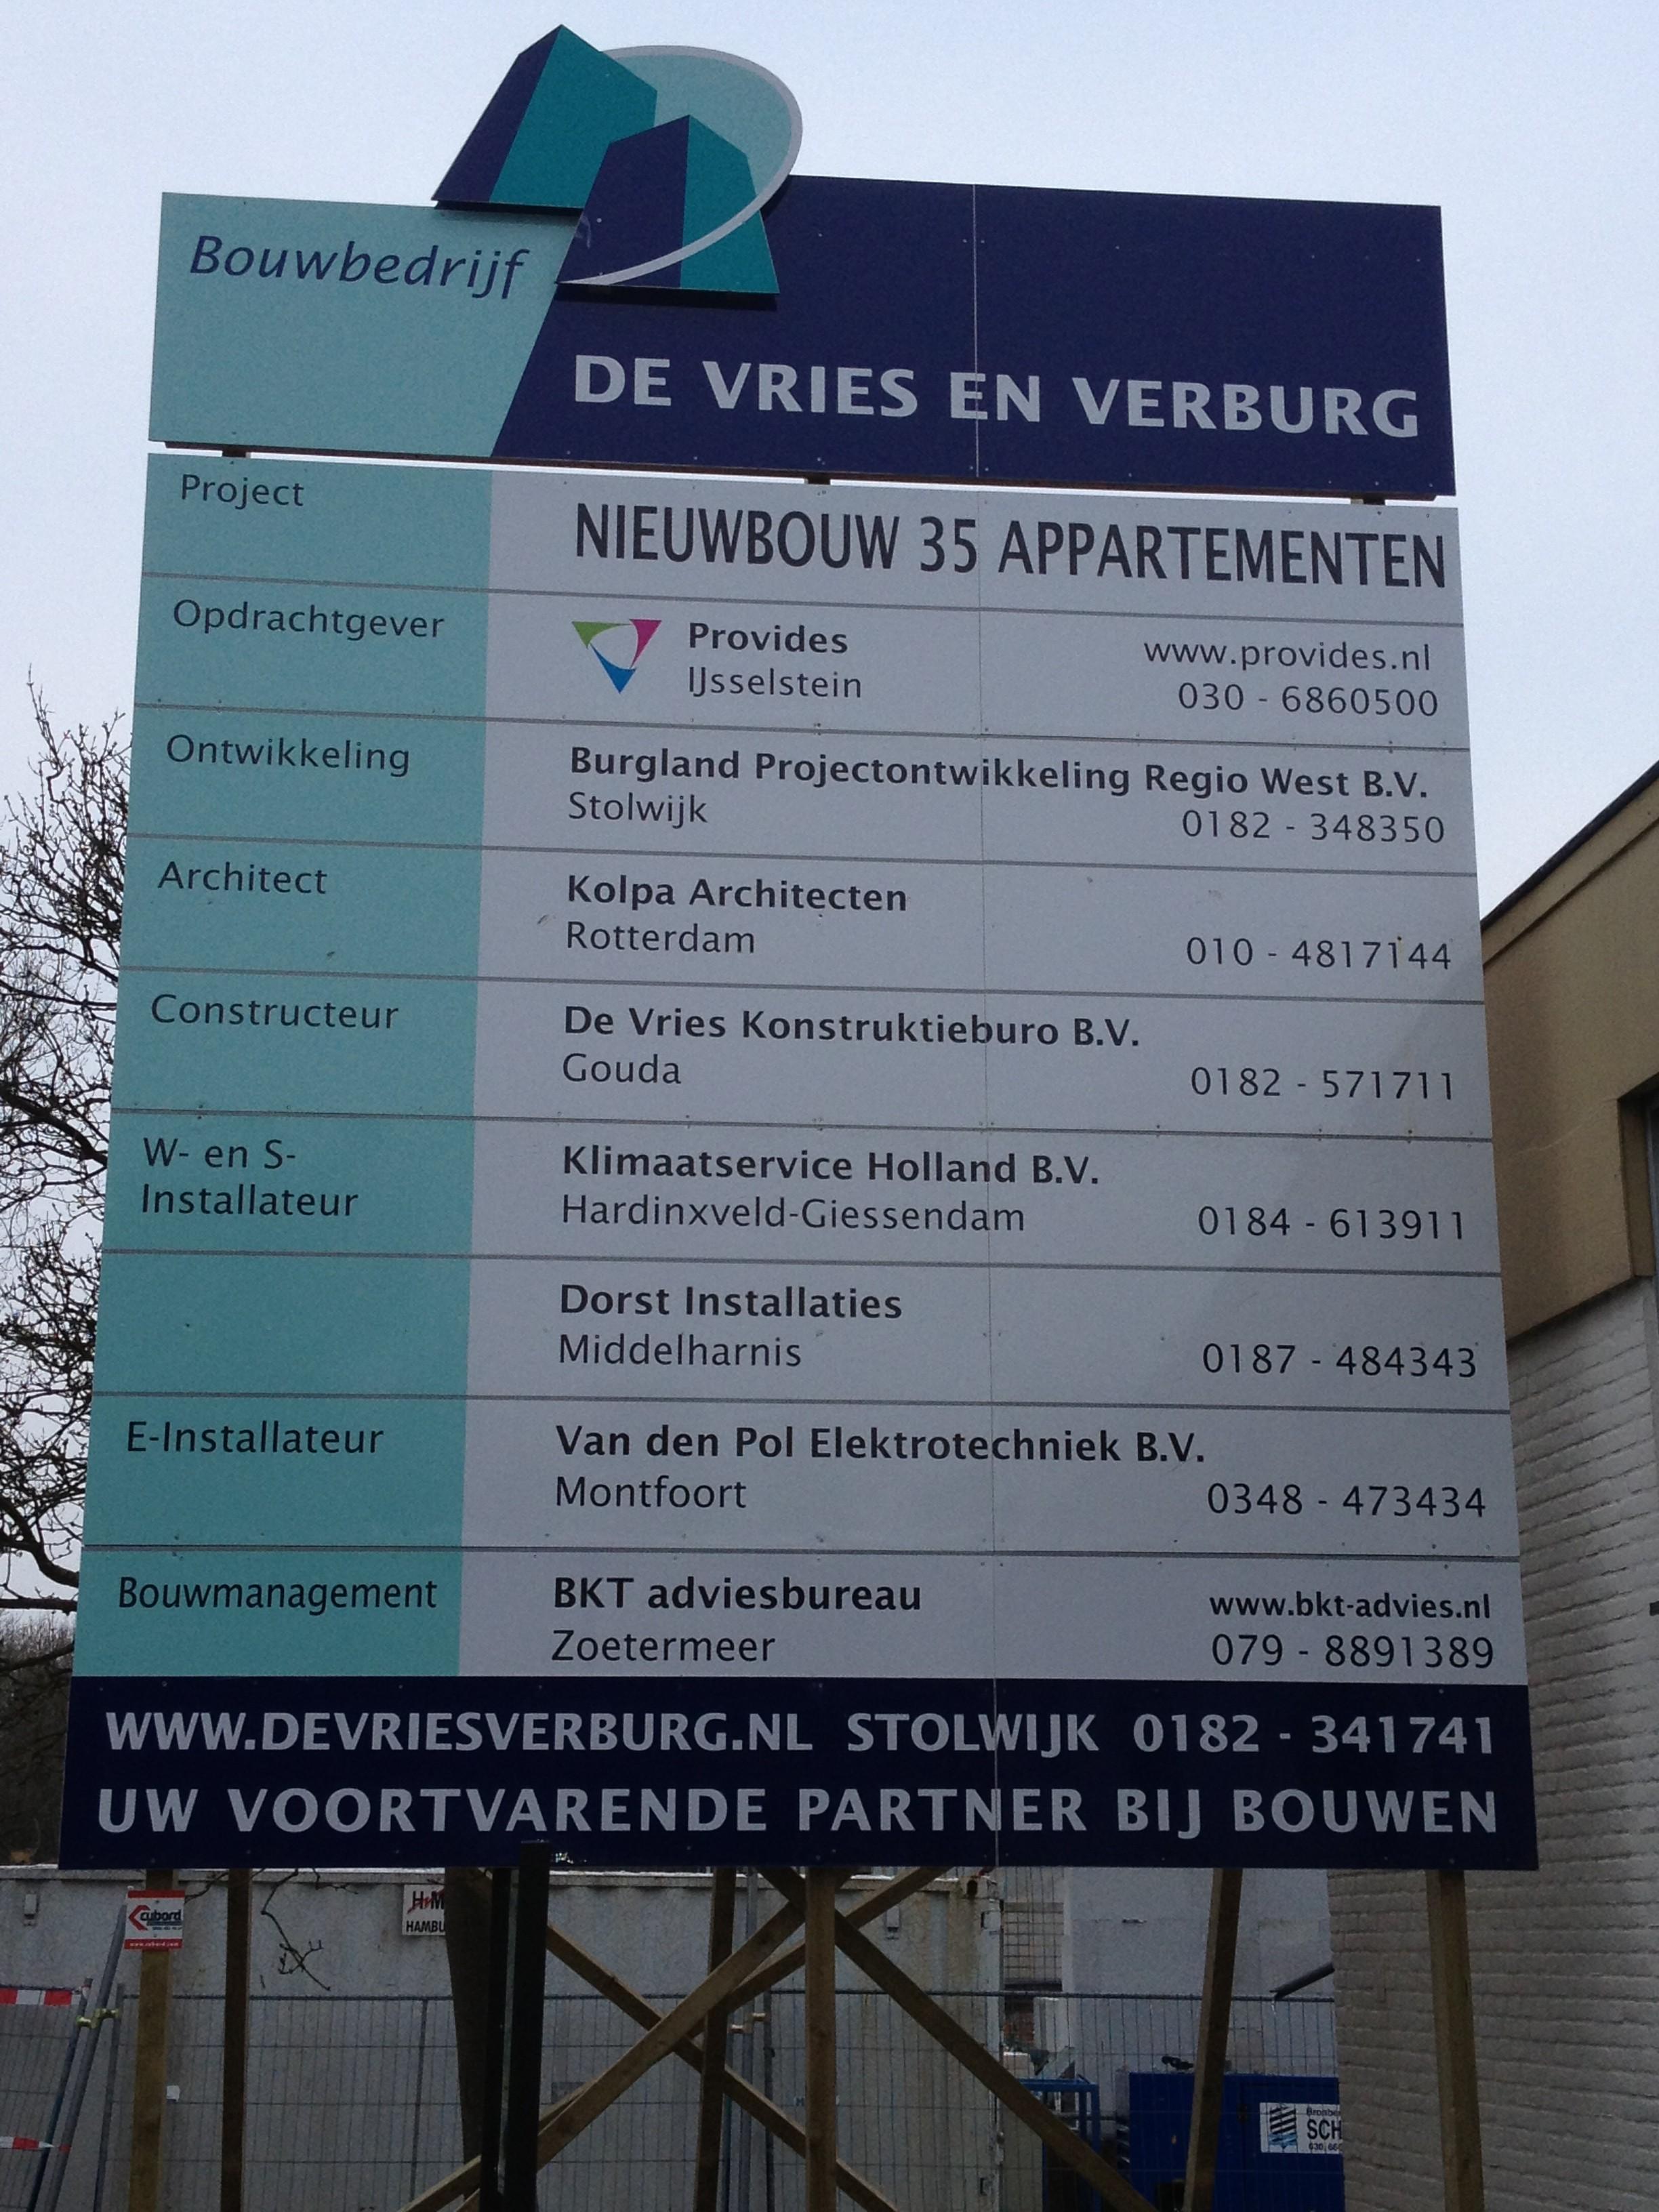 BKT_provides_devriesenverburg_IJsselstein_appartementen_Panoven_parkeerkelder_schuindak_metslwerk_zink_bouwbord_Cubord_Esbi_01.jpg